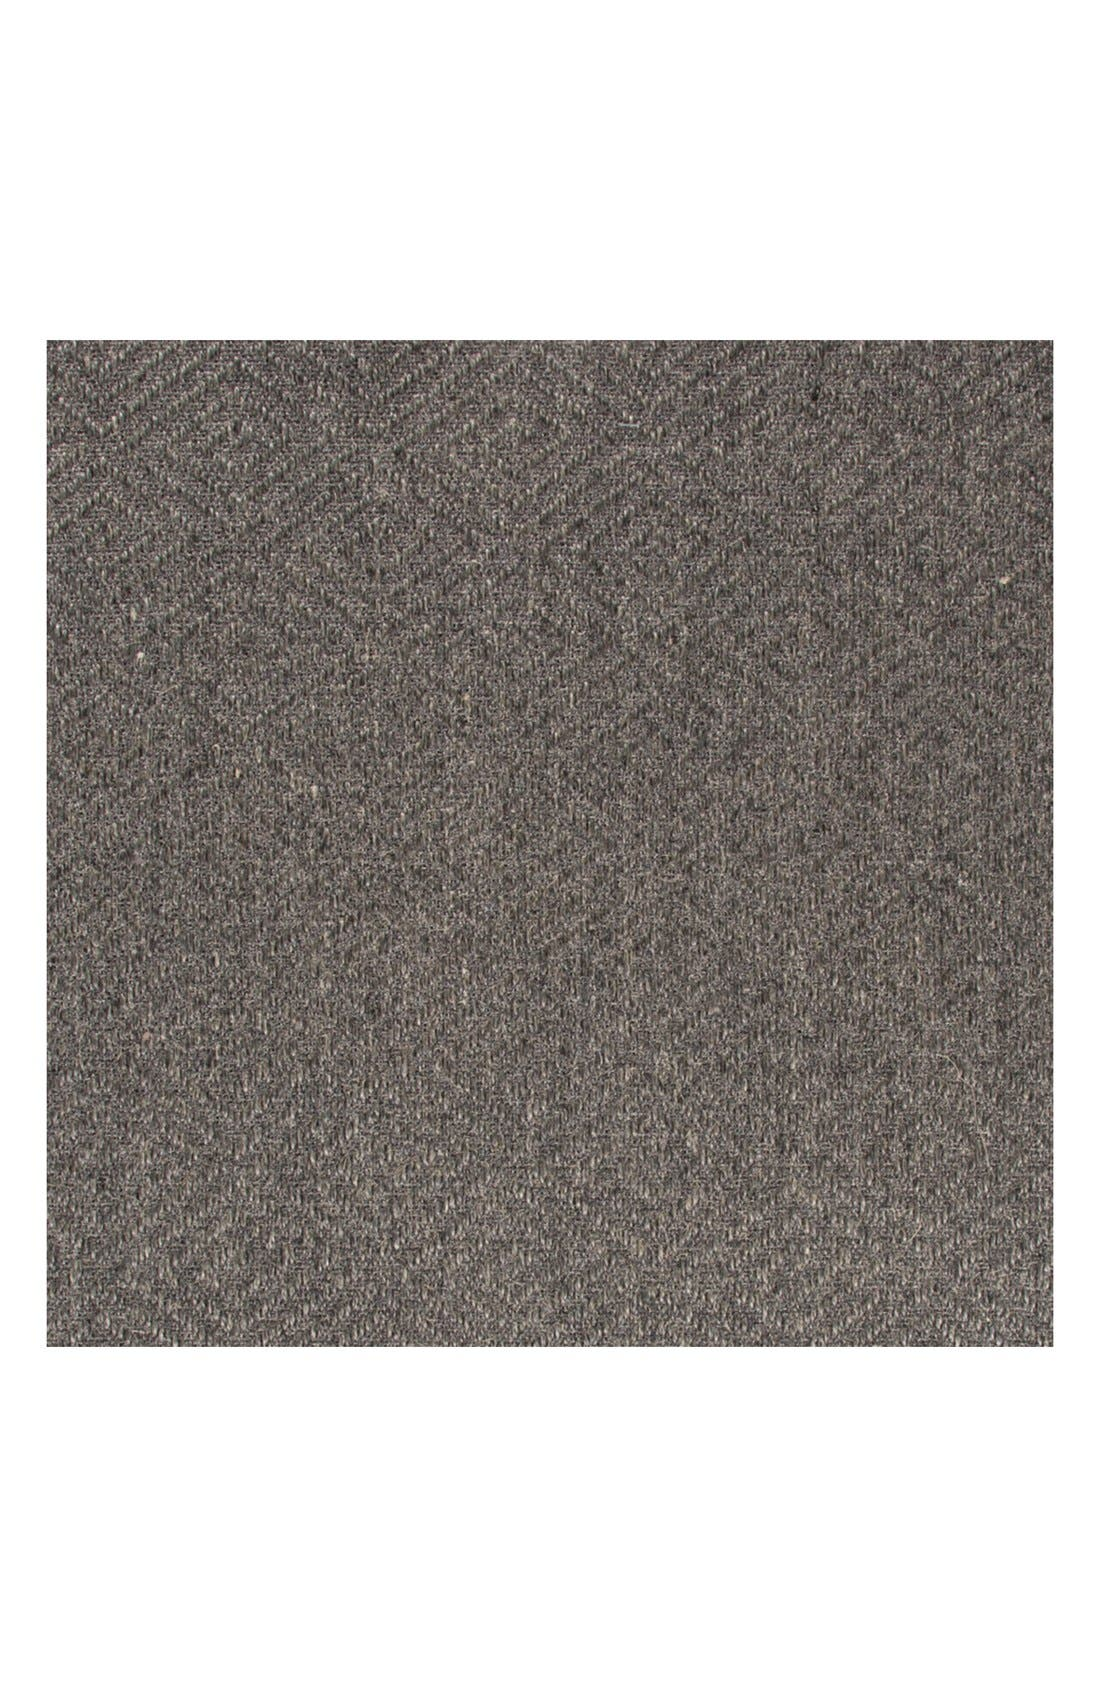 'Tobago Naturals' Hand Woven Rug,                             Alternate thumbnail 3, color,                             025